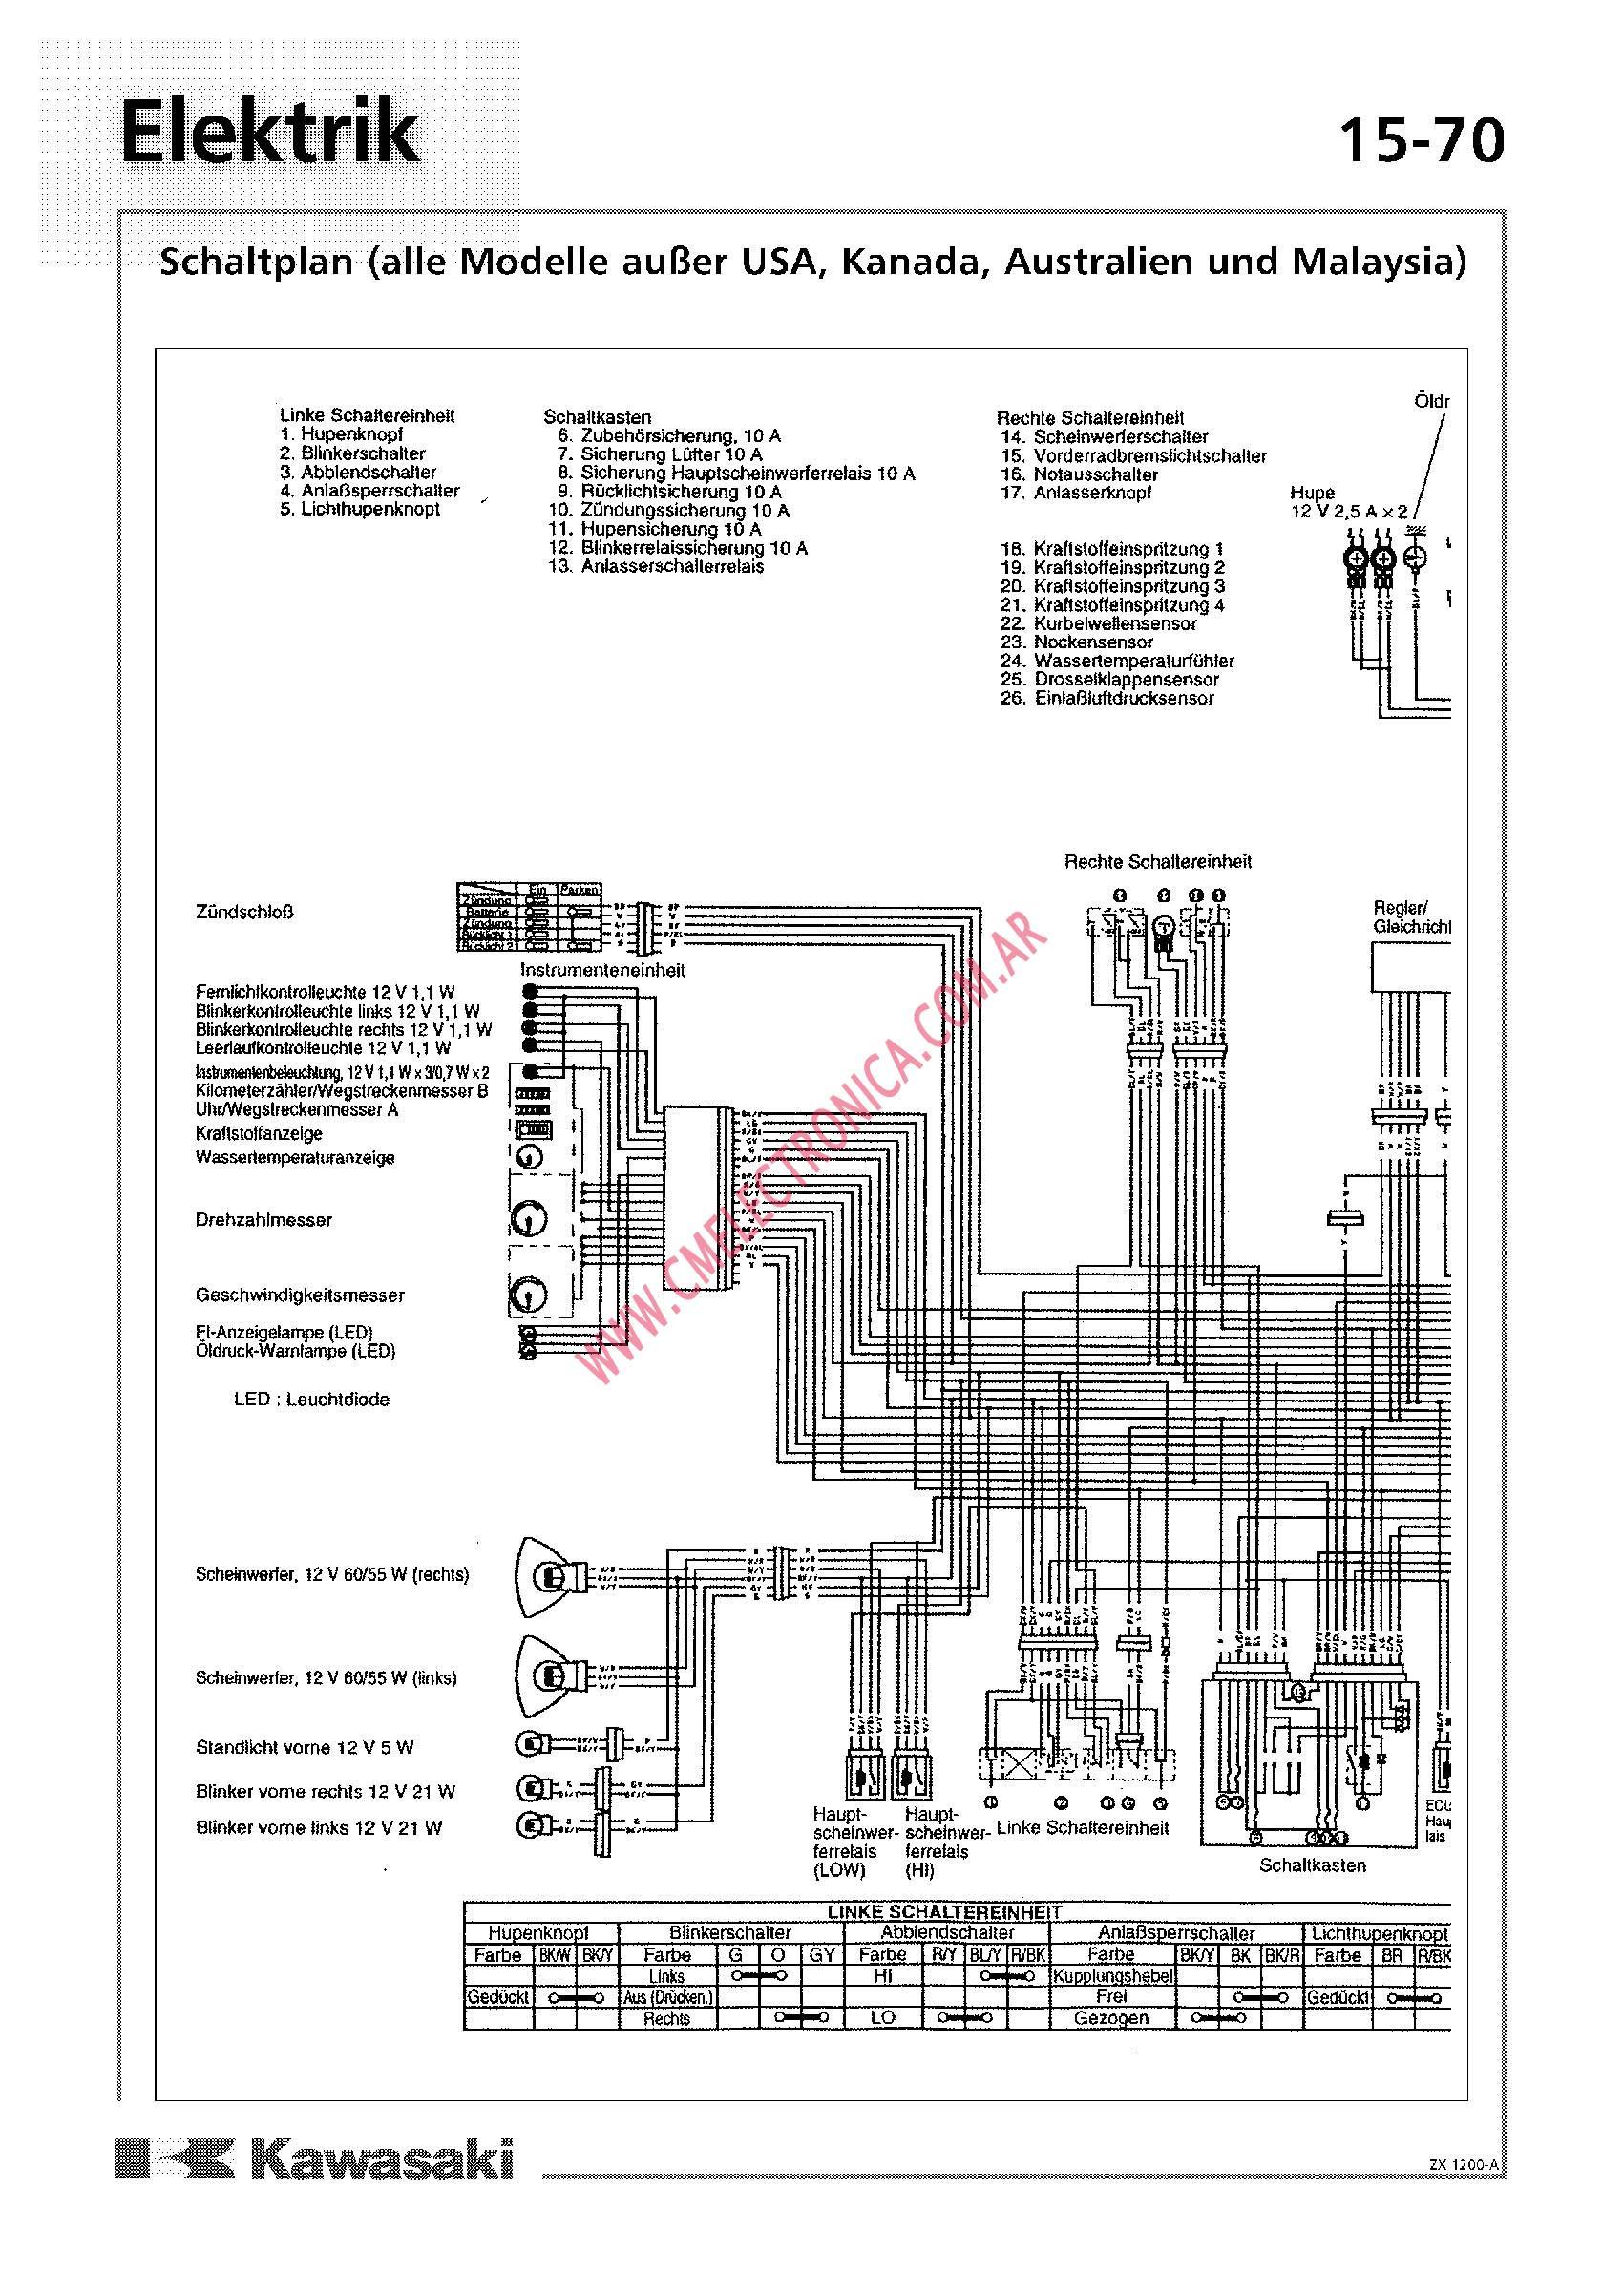 Wiring Diagram Zx12r - Home Wiring Diagram | Wiring Schematics 2000 Kawasaki Zx 12r |  | Home Wiring Diagram